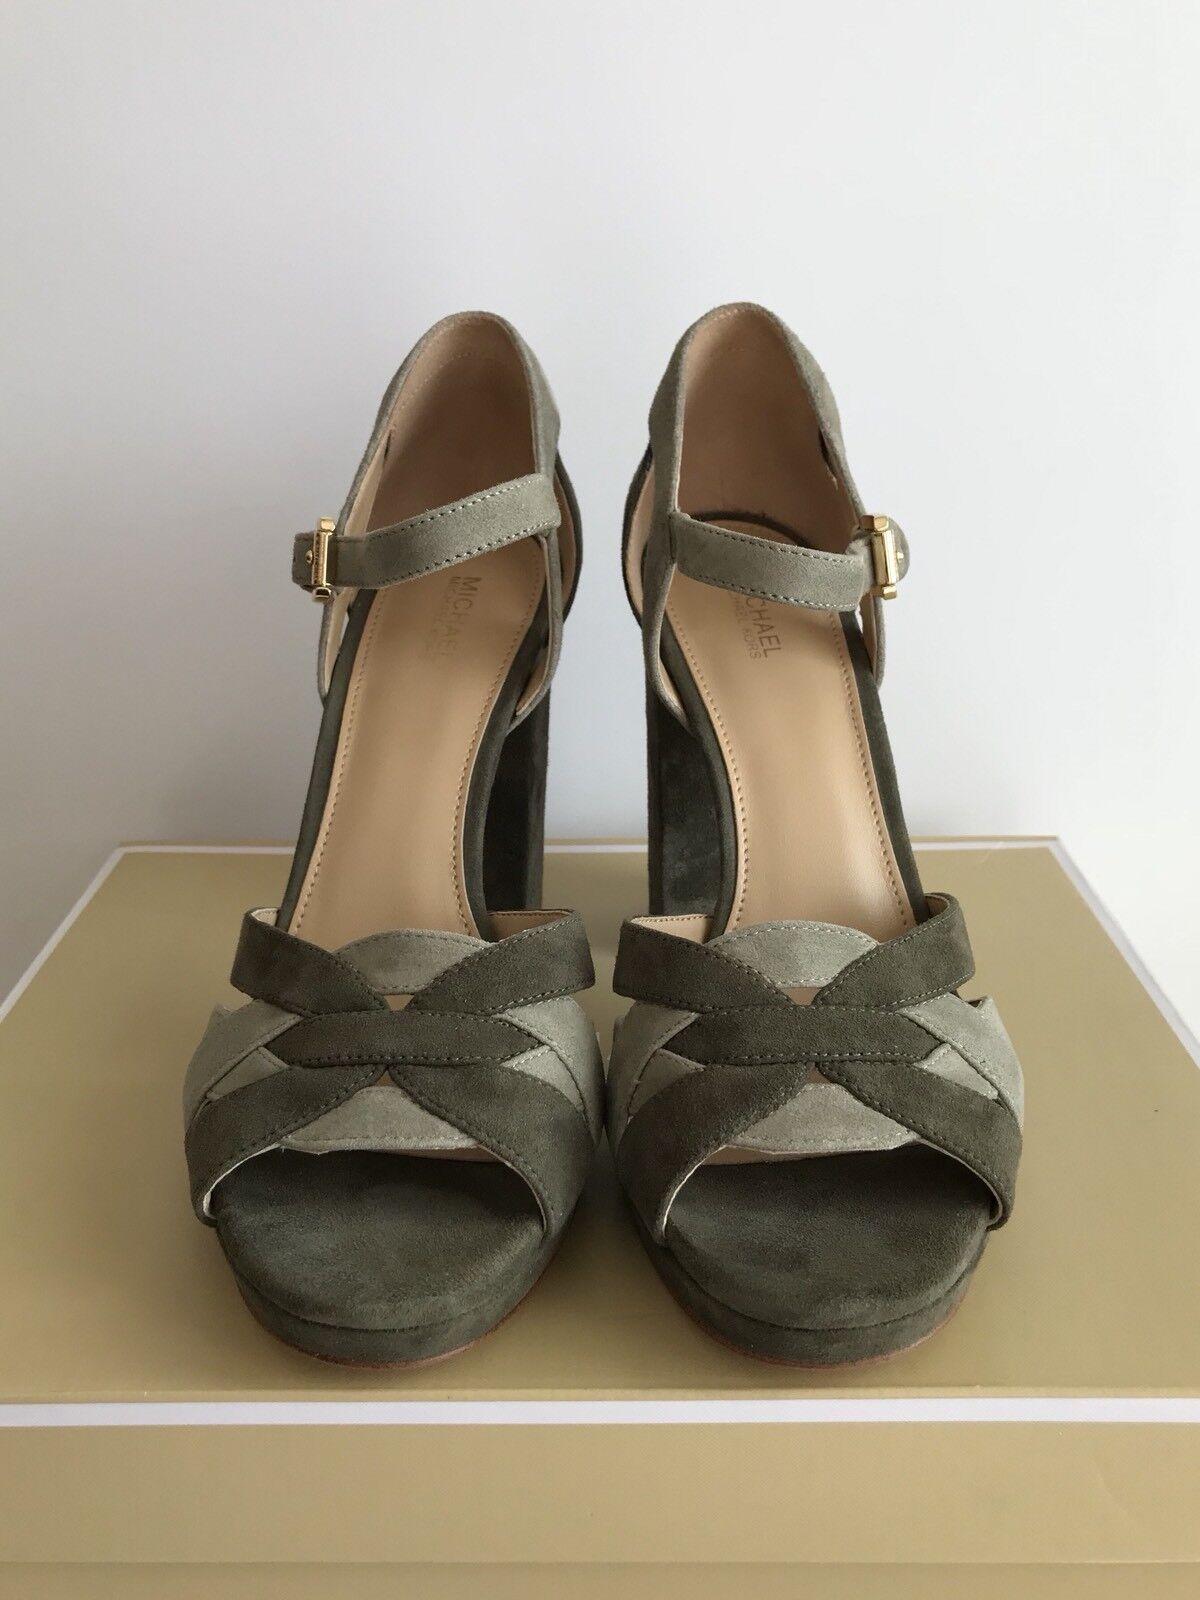 855fe814f5f5 Michael Kors Annaliese Platform High Heel Suede Olive Sage Sandal 9 ...